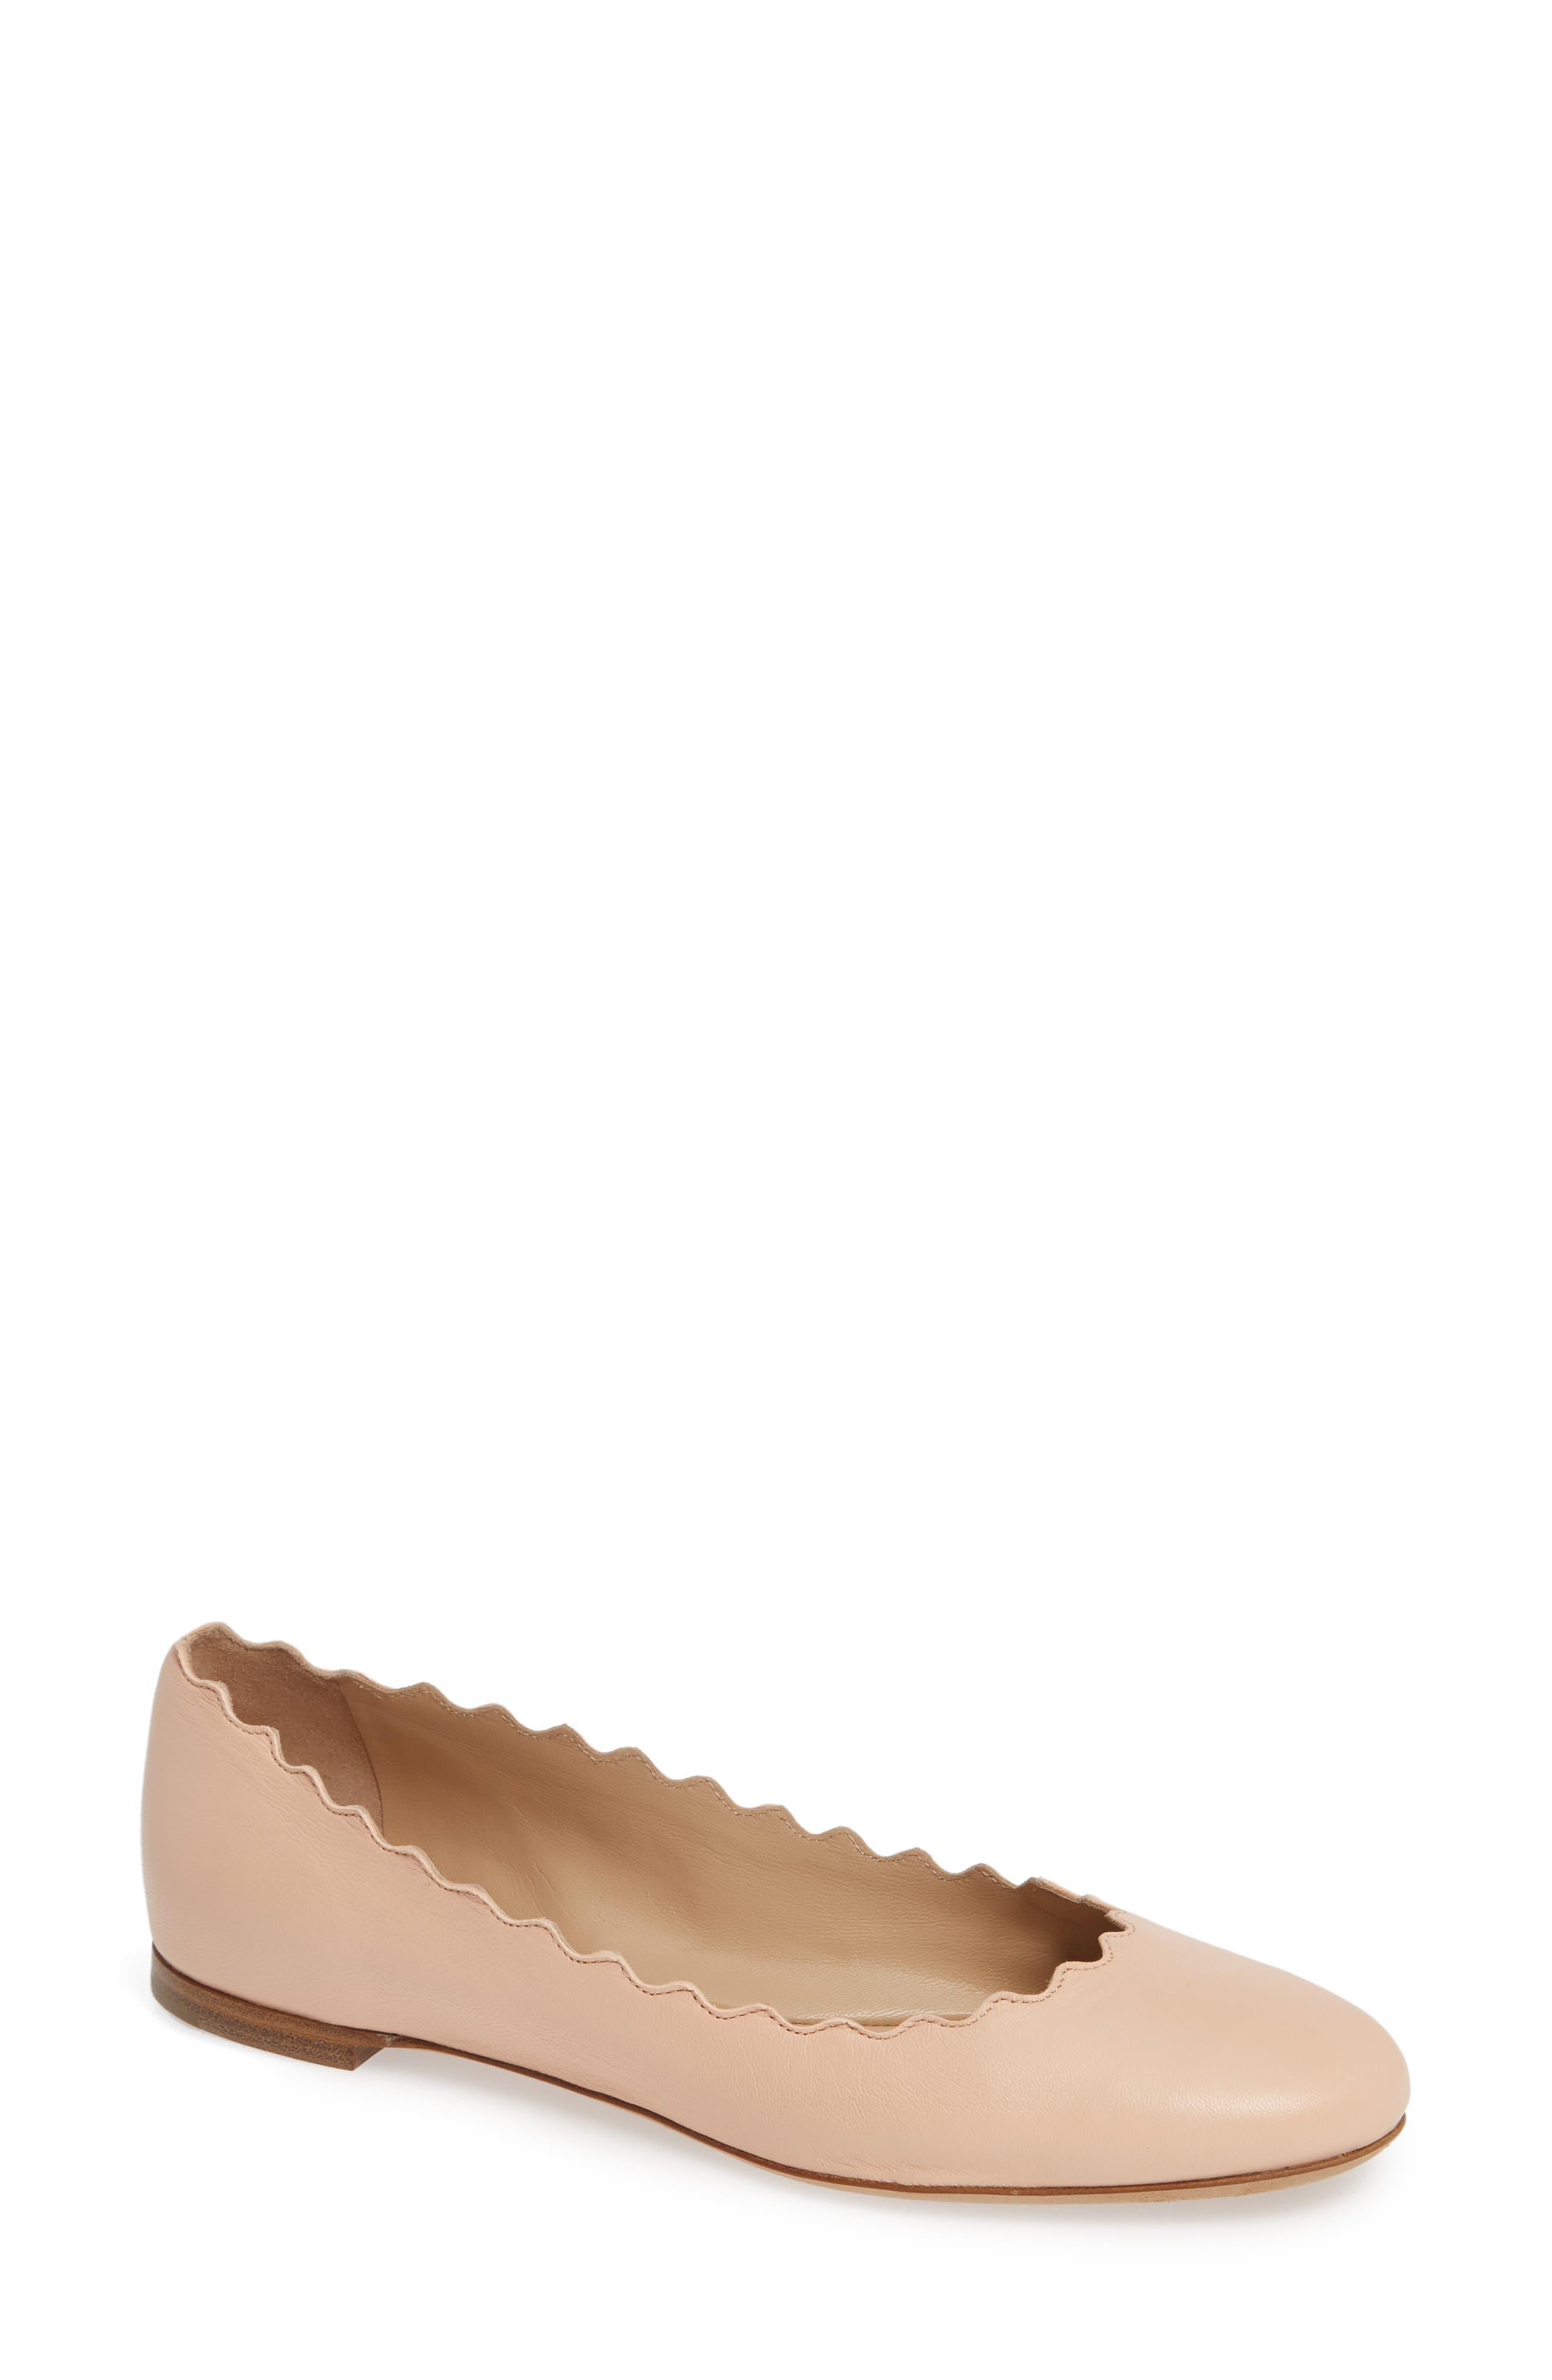 CHLOÉ 'Lauren' Scalloped Ballet Flat, Main, color, DELICATE PINK LEATHER